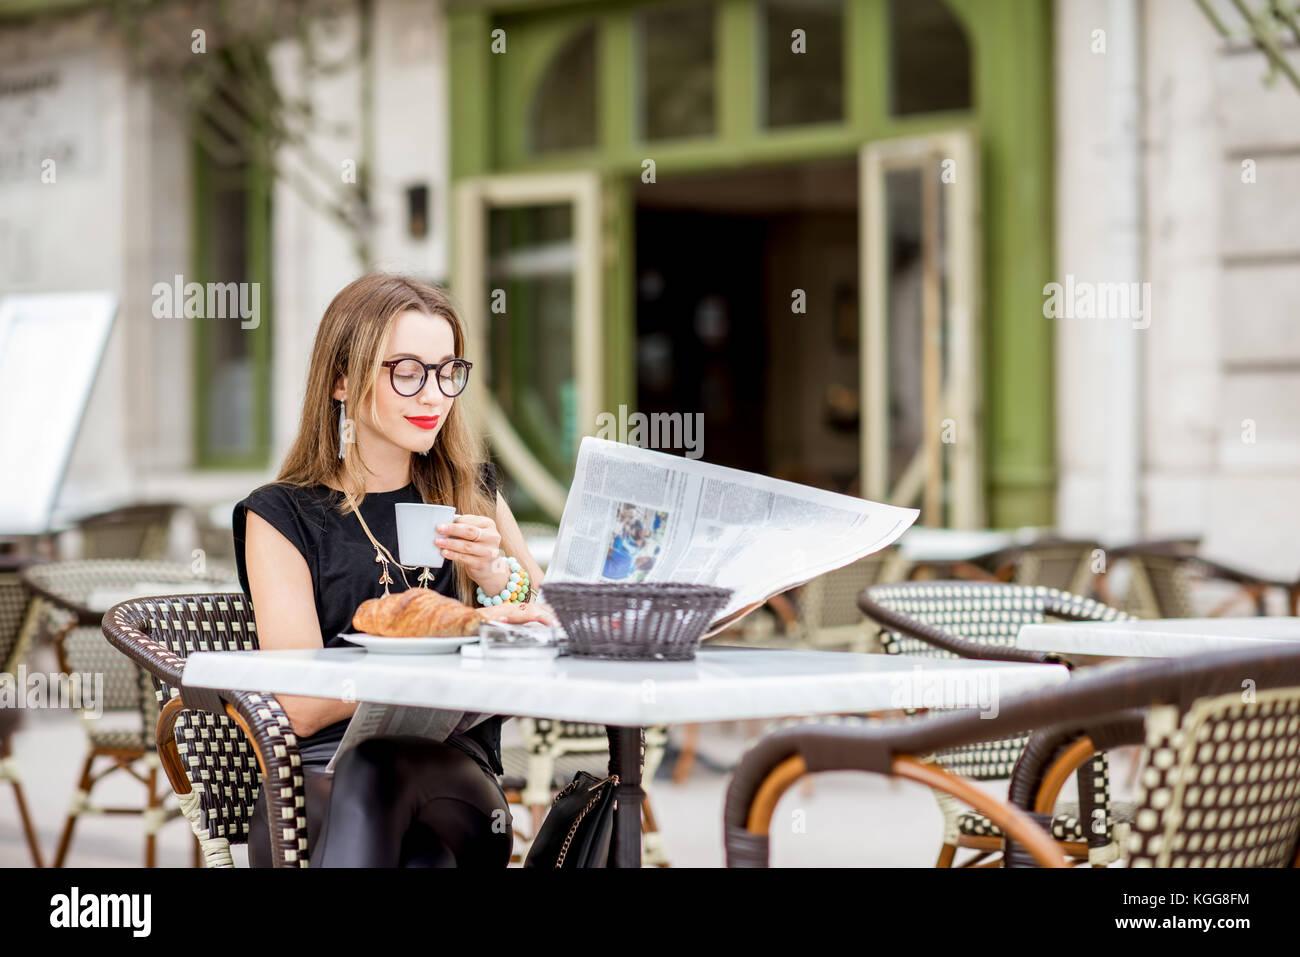 Mujer en el café francés Imagen De Stock